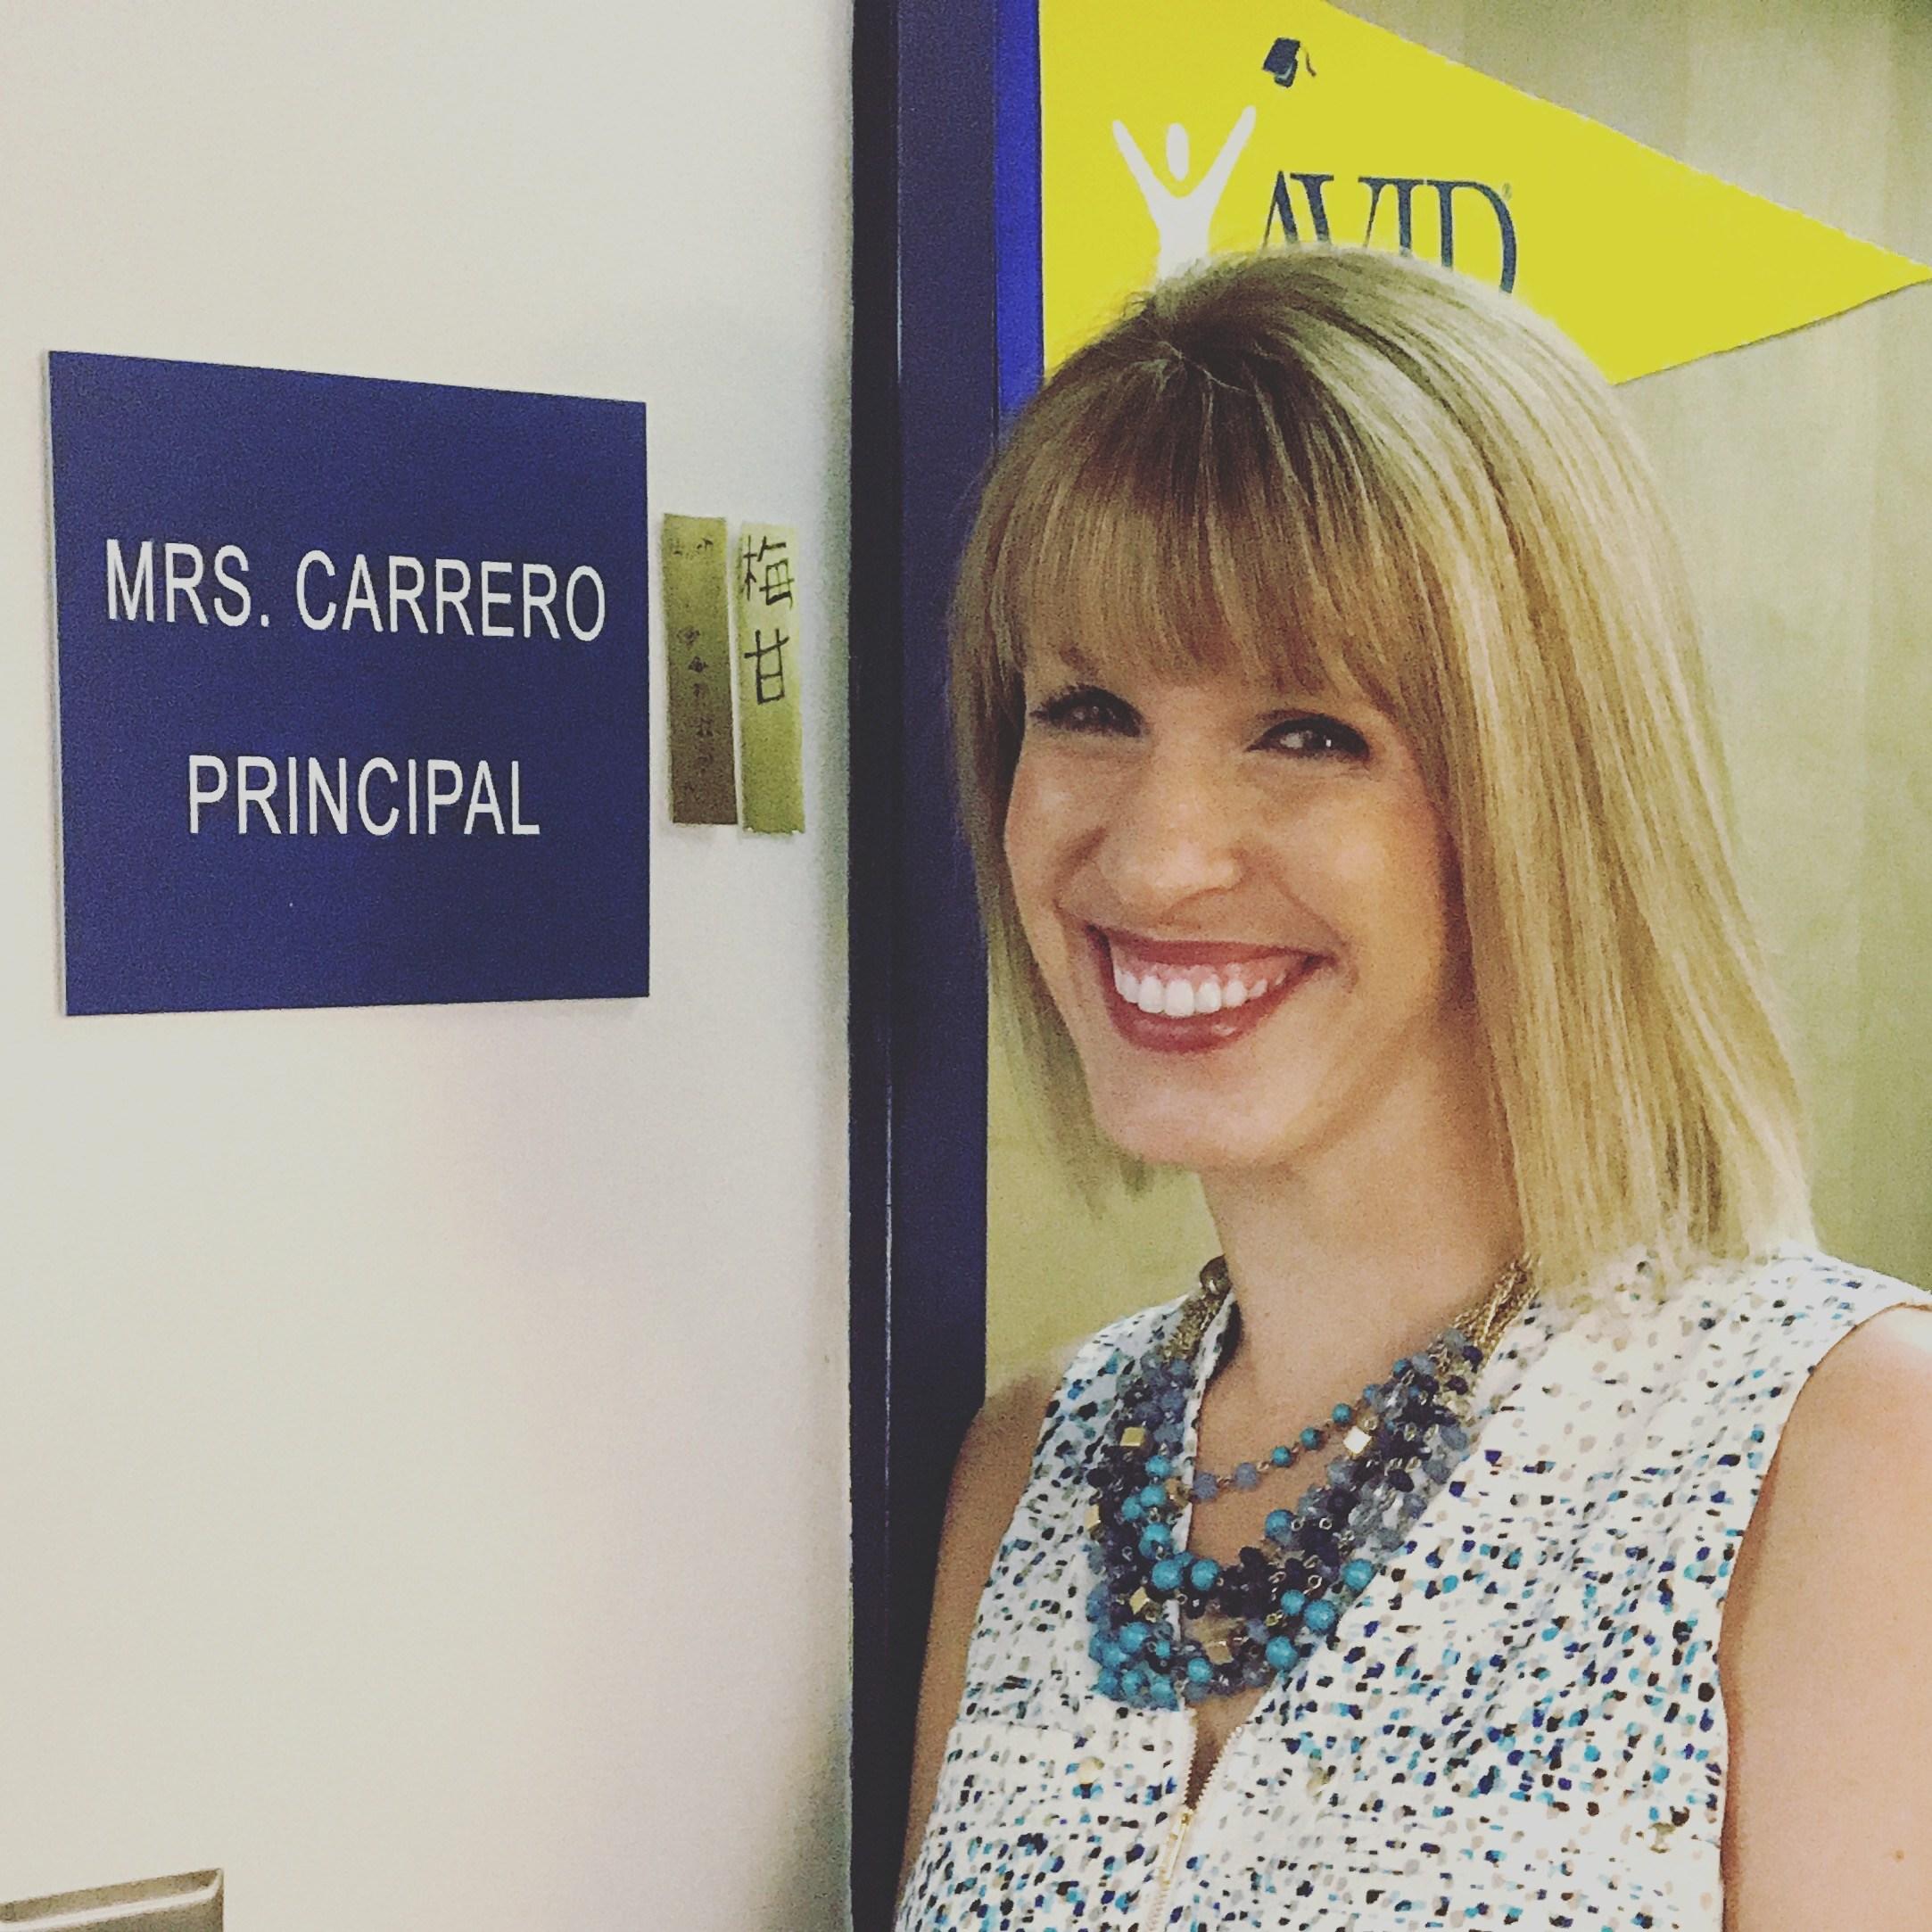 Megan Carrero, Principal